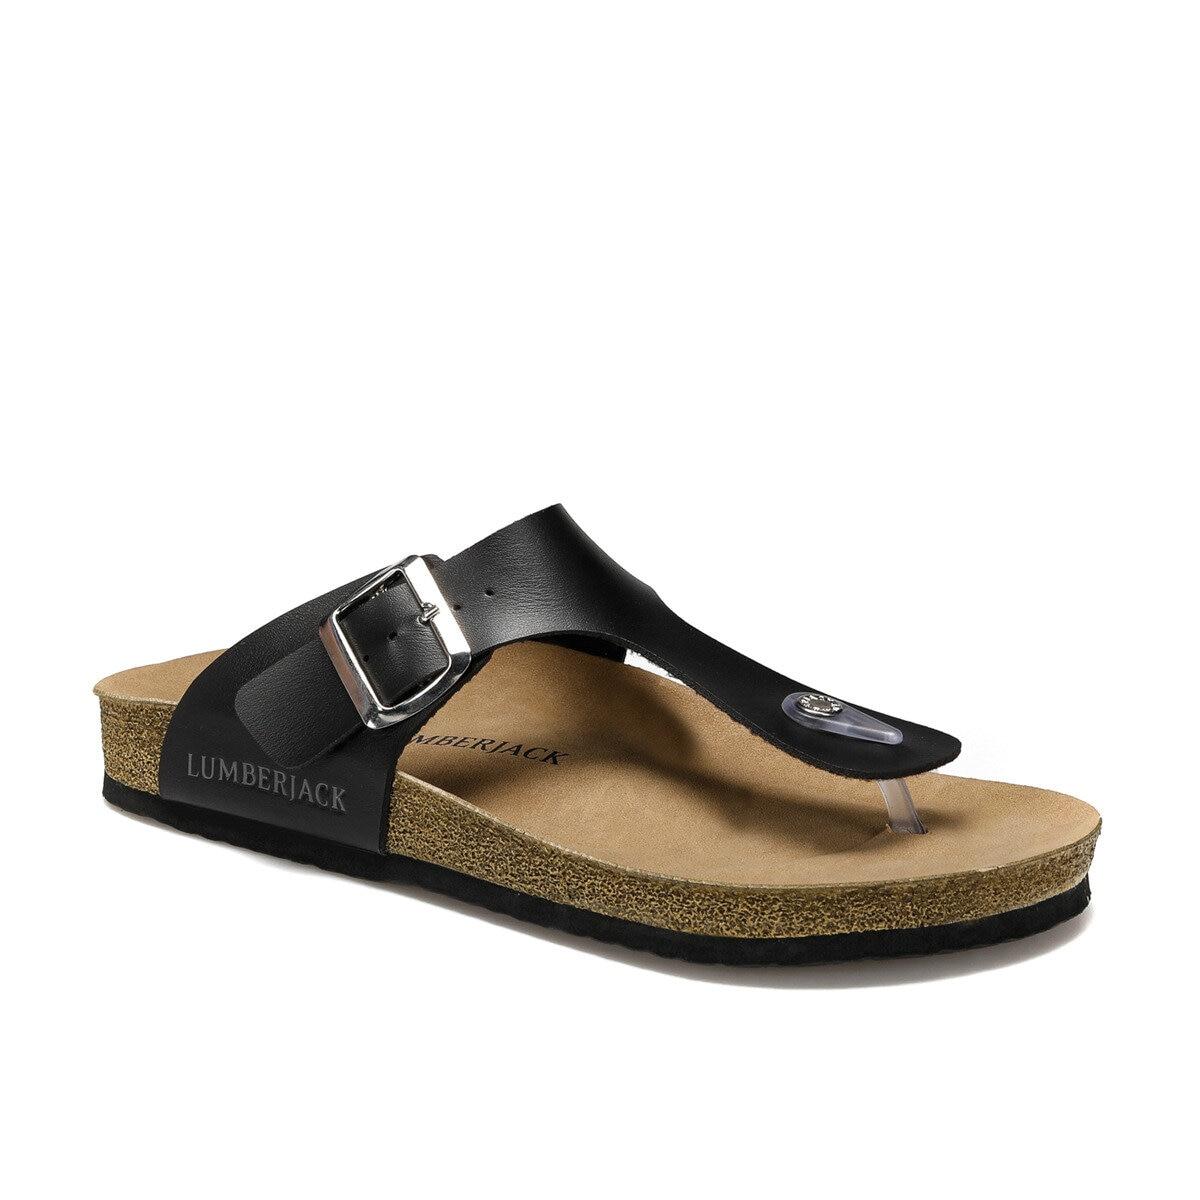 FLO Men Slippers Fashion Comfortable Summer Beach Pool Footwear Black Male Slippers Shoes Мужские тапочки BITE LUMBERJACK